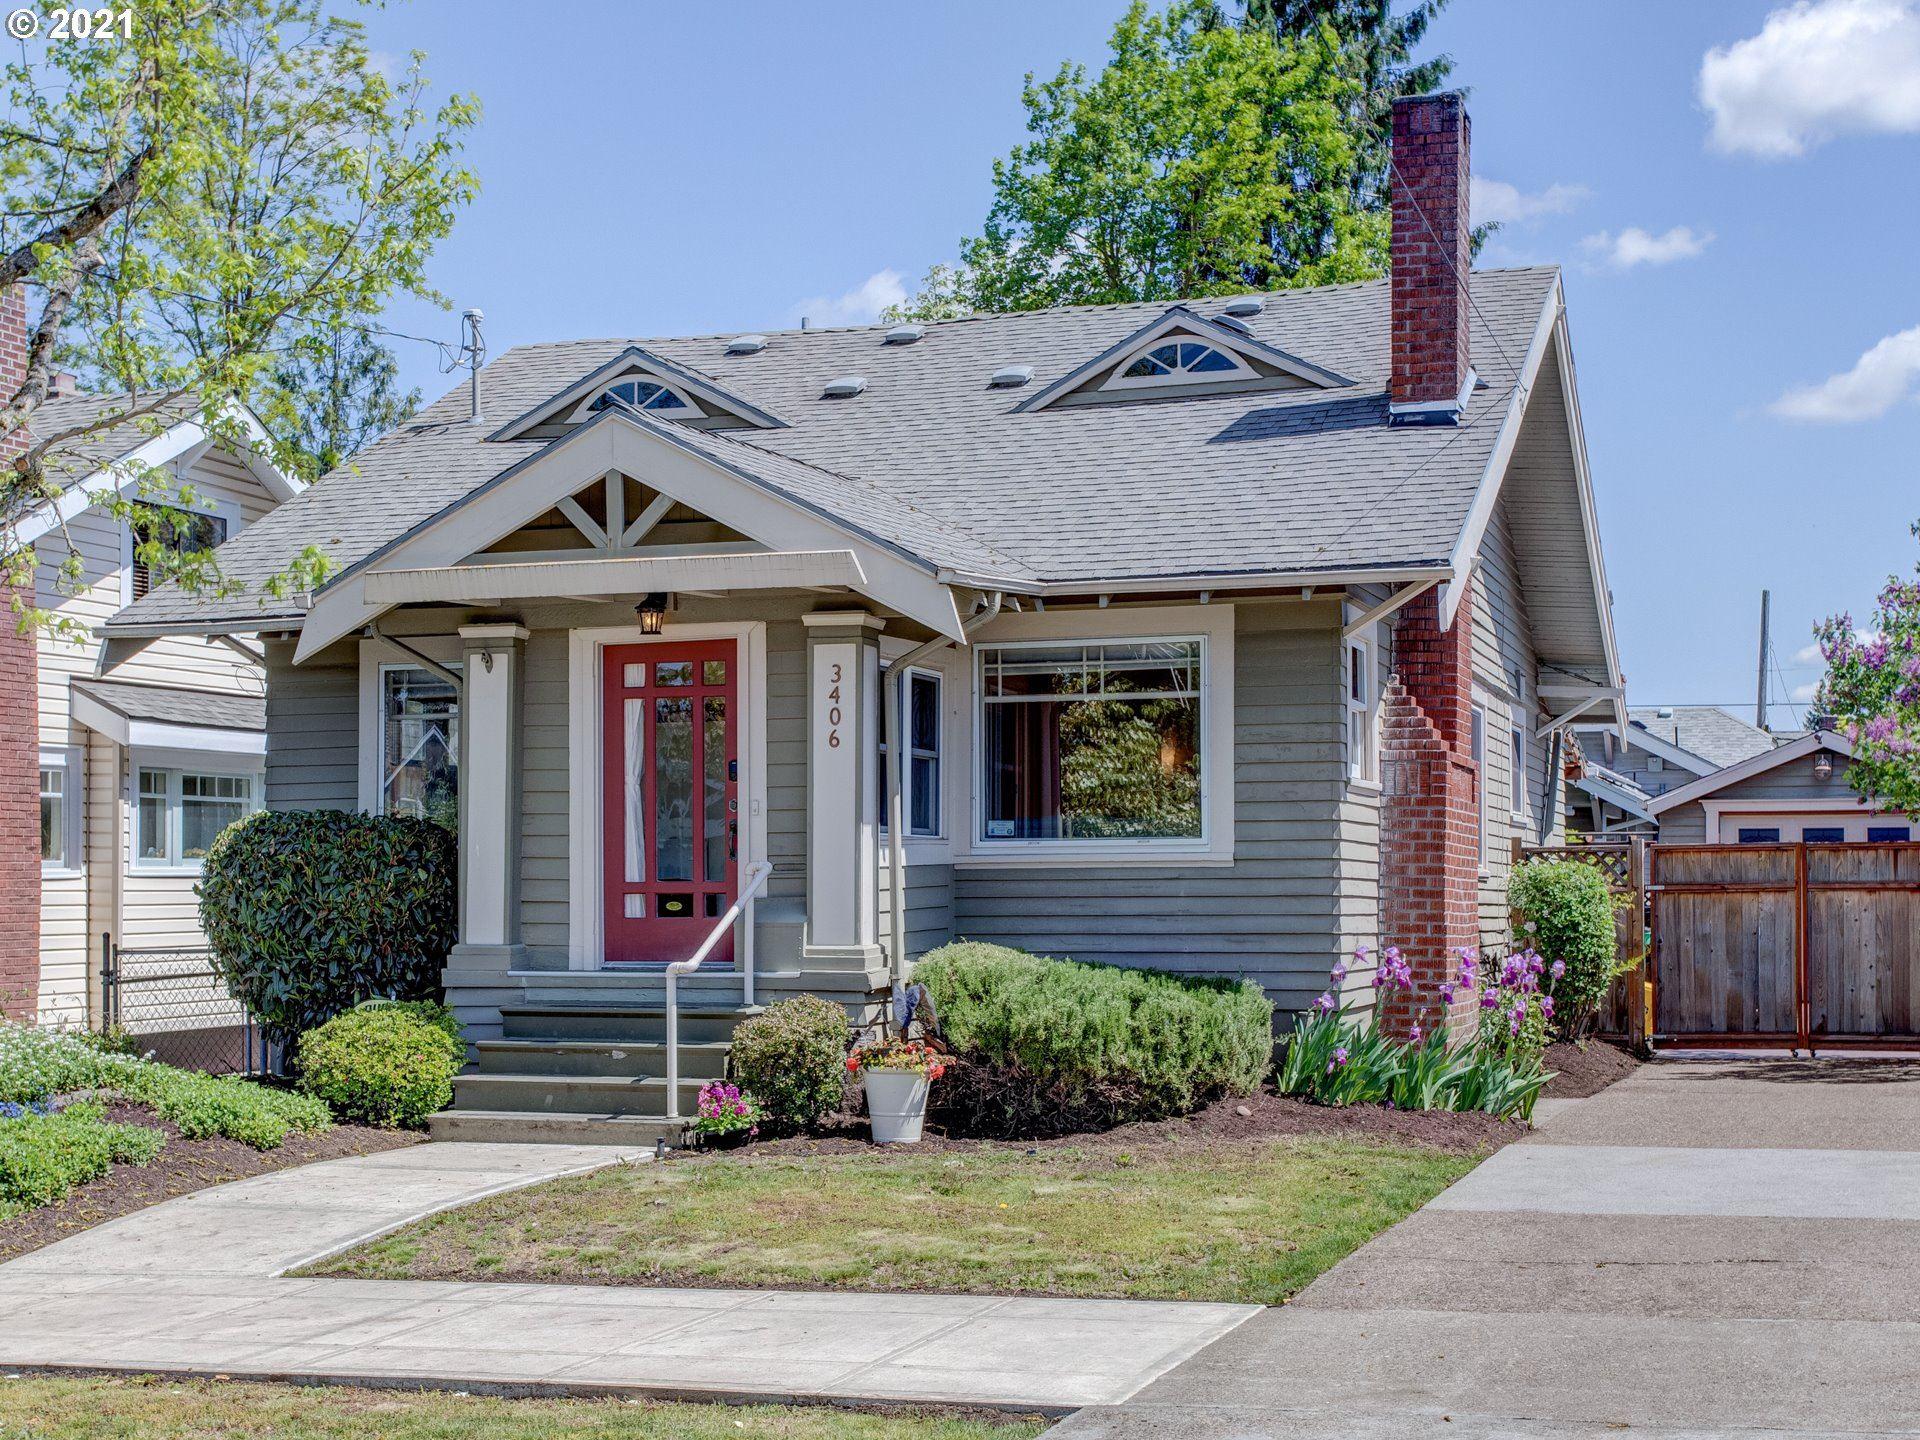 3406 NE 64TH AVE, Portland, OR 97213 - MLS#: 21226930